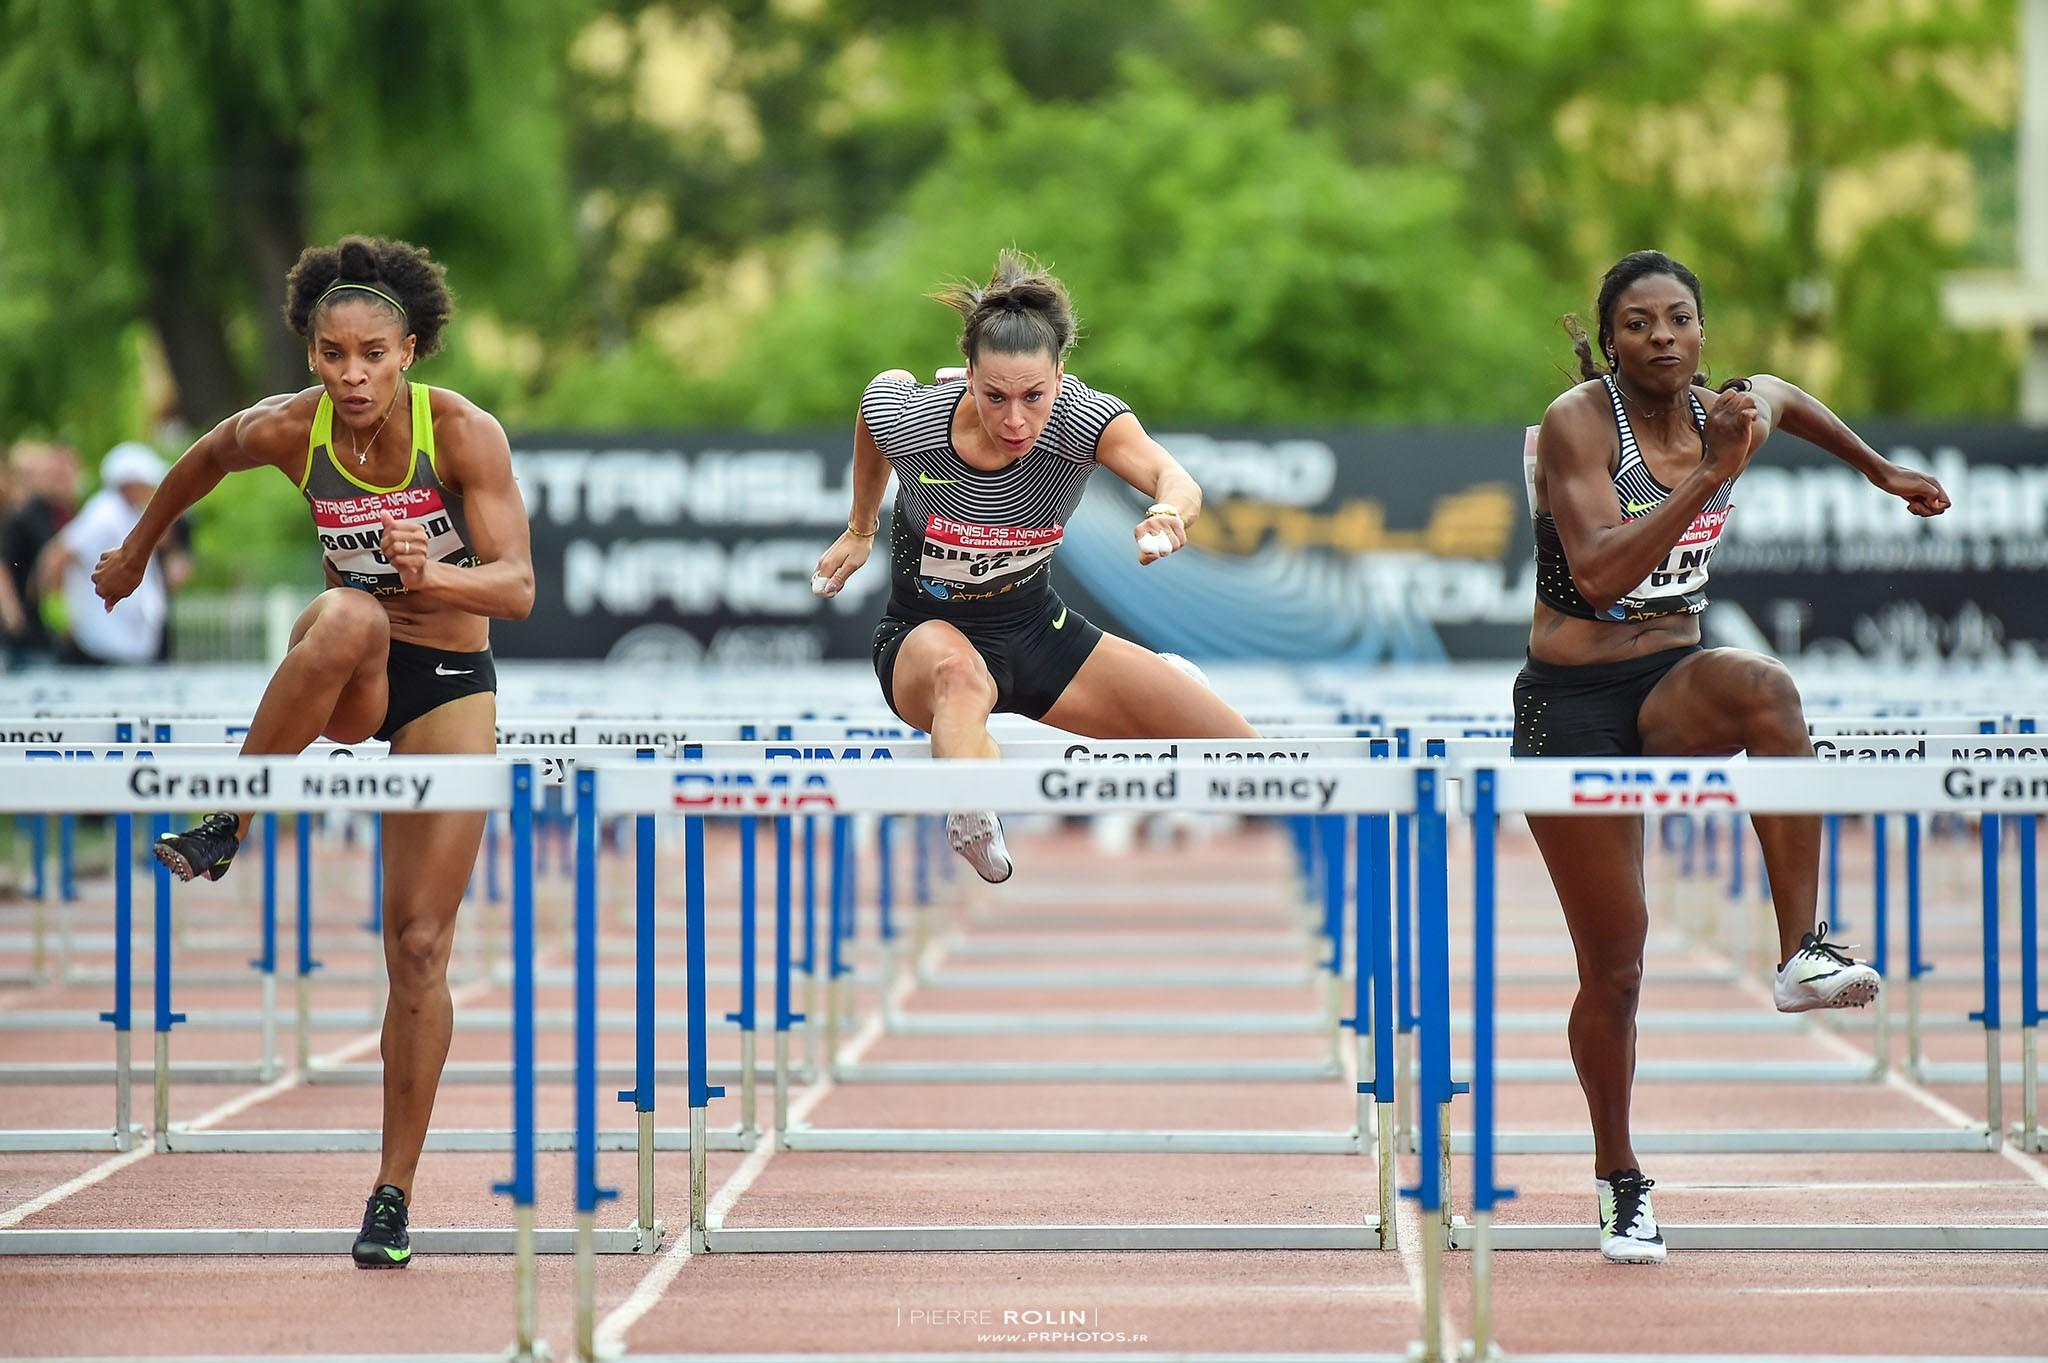 Cindy Billaud, athlétisme | Sport professionnel